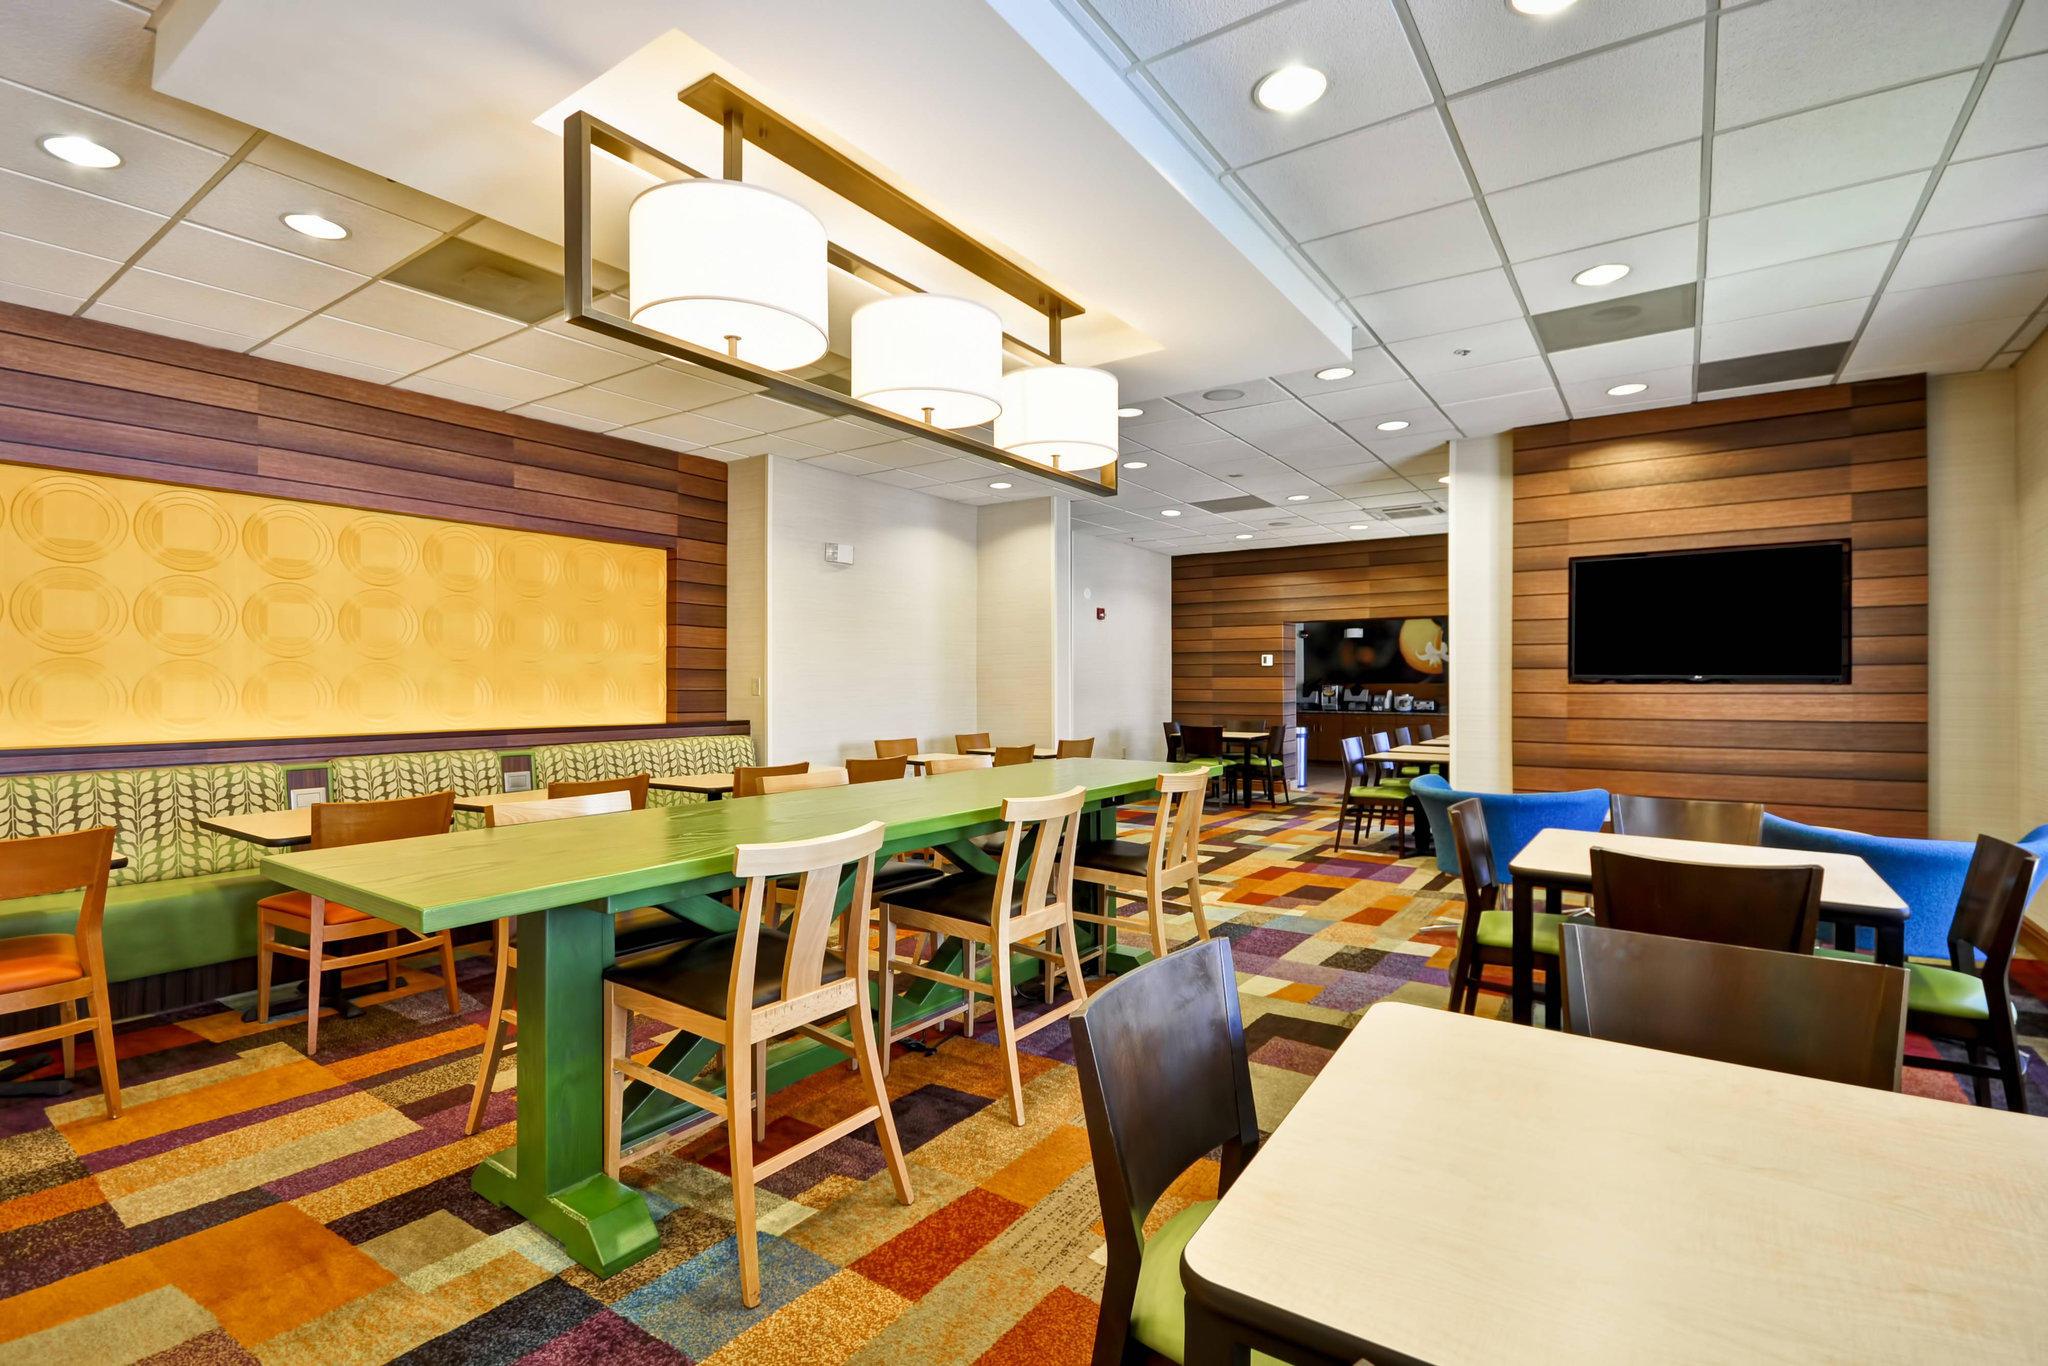 Fairfield Inn & Suites by Marriott Atlanta Vinings/Galleria